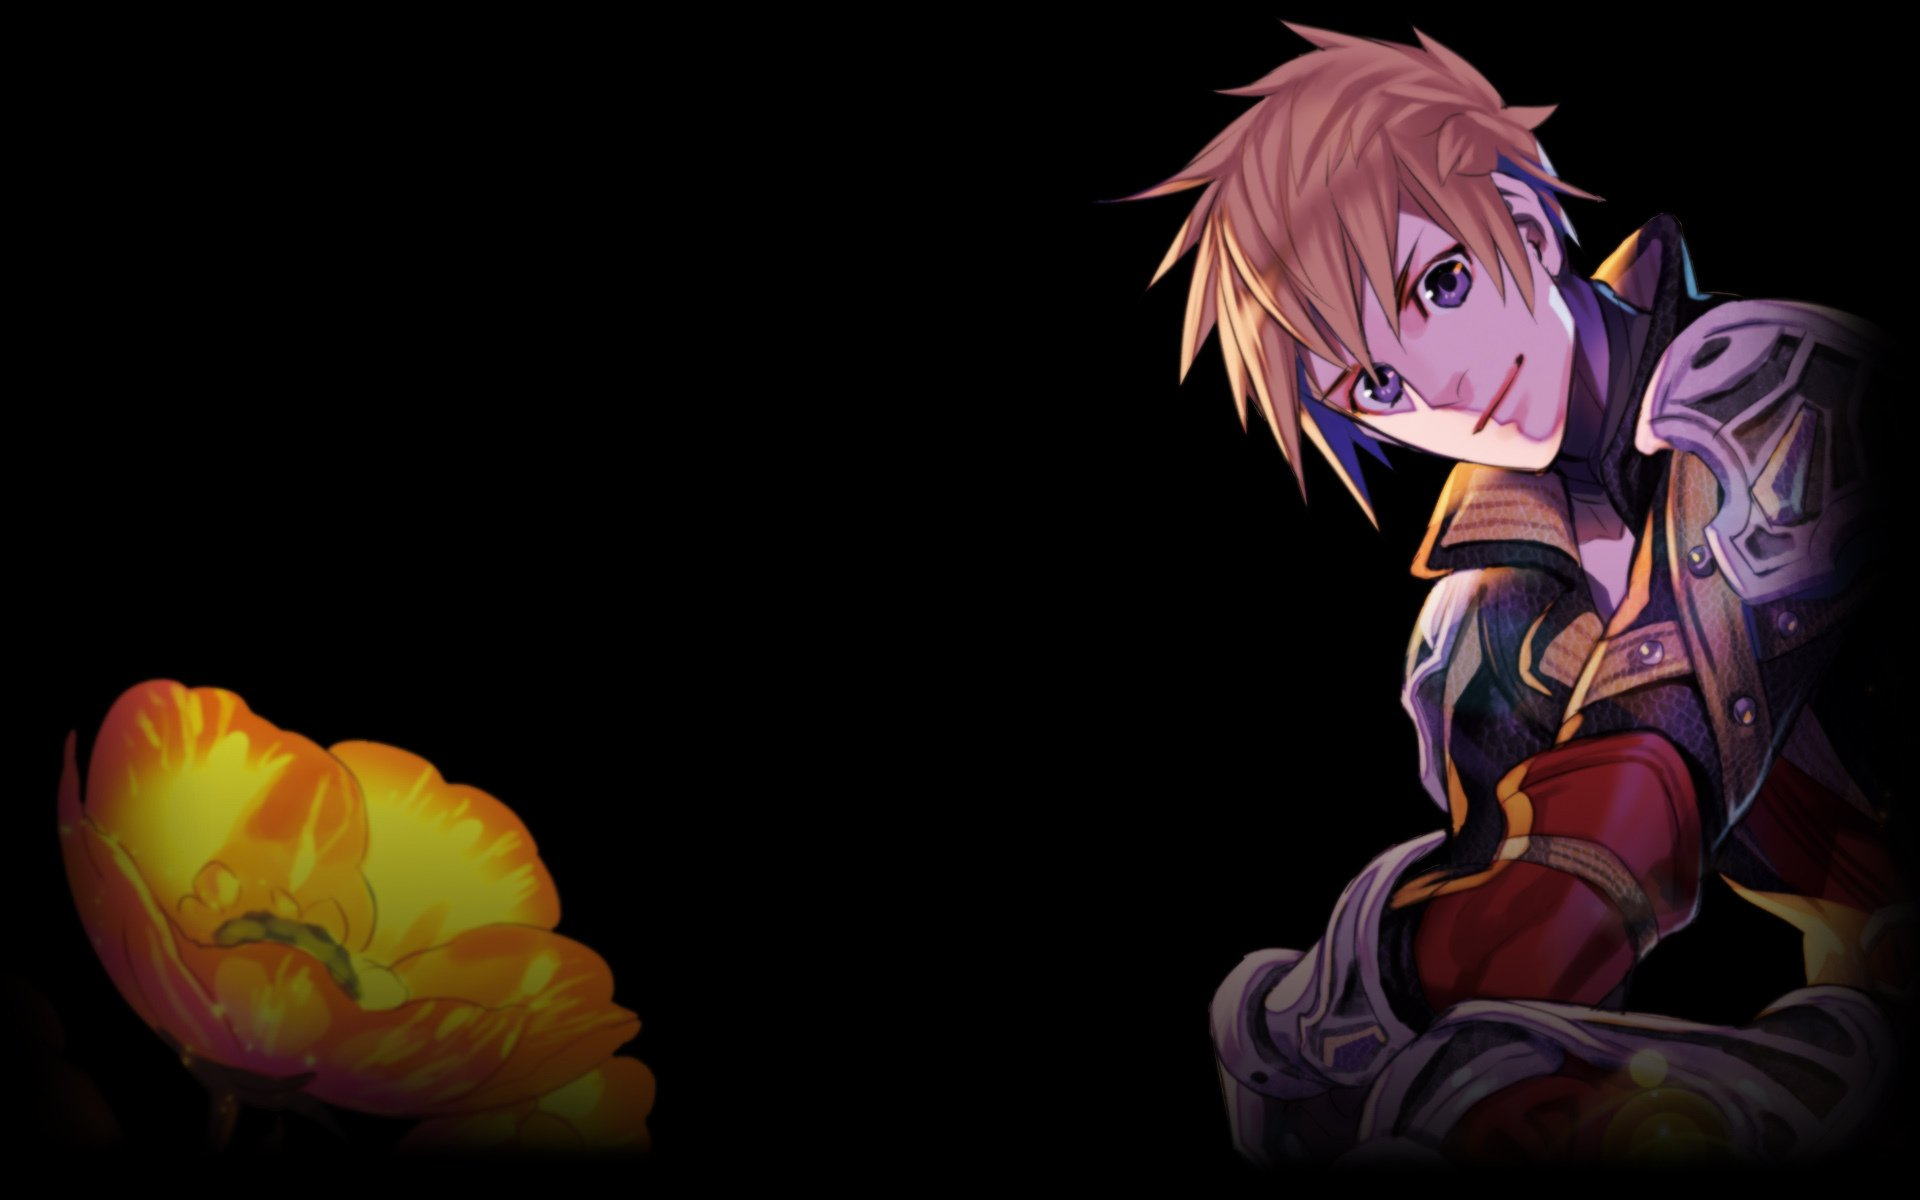 RPG Maker VX Ace HD Wallpaper   Background Image   1920x1200